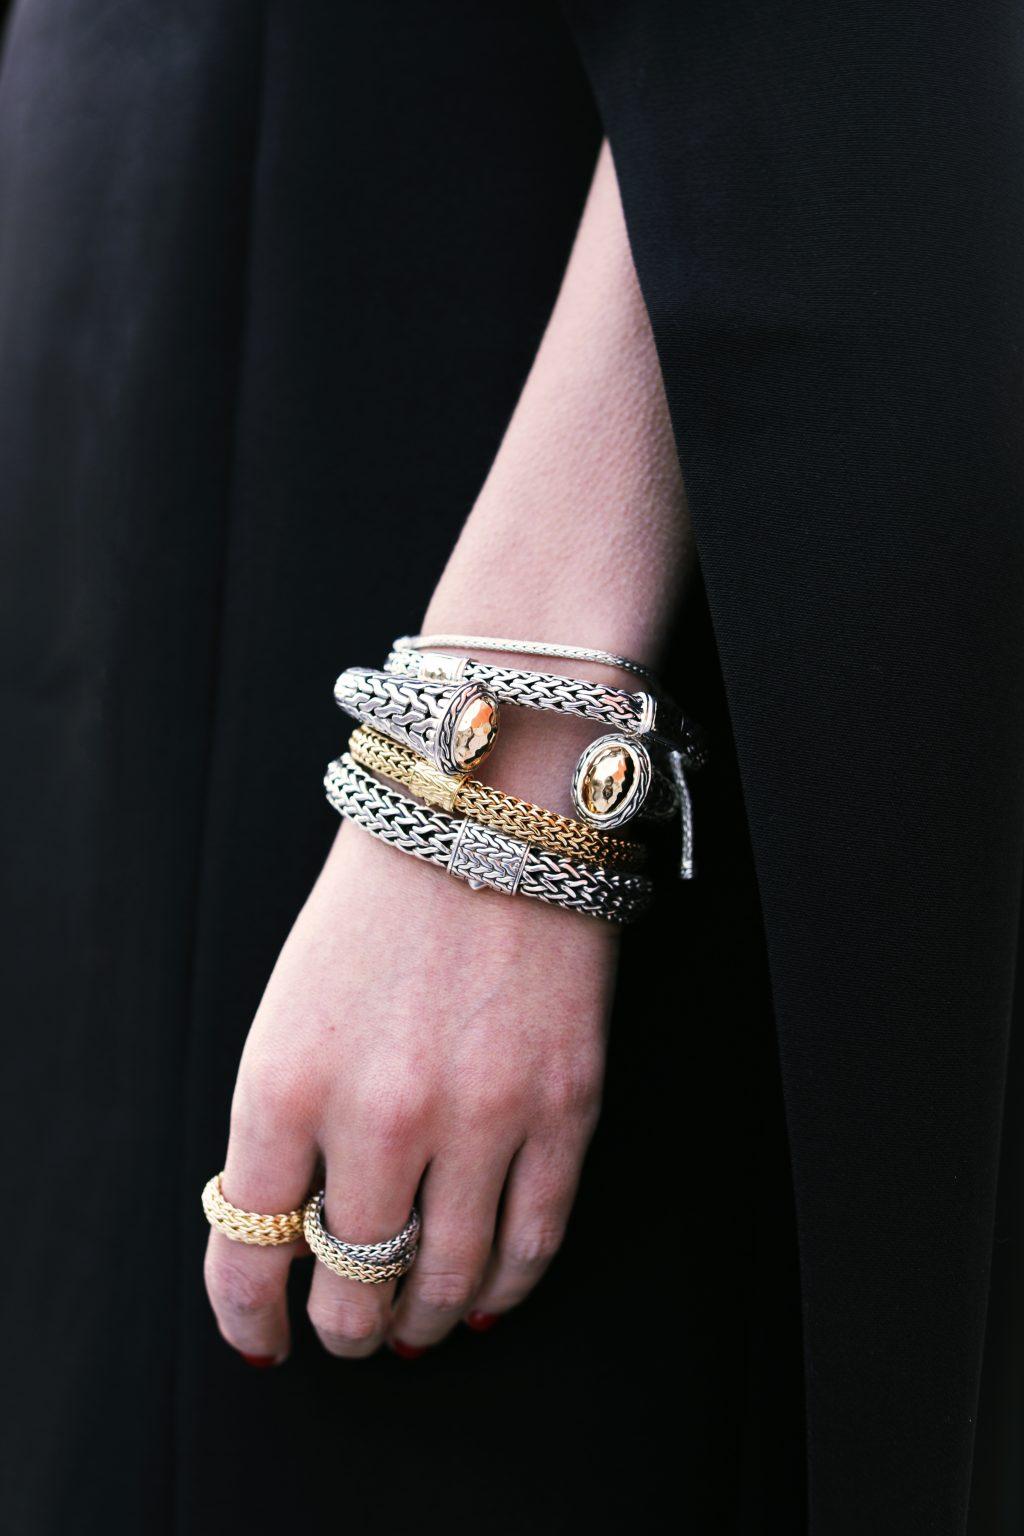 ap-blog-blogger-john-hardy-bracelets-stacking-gold-silver-mix-soho